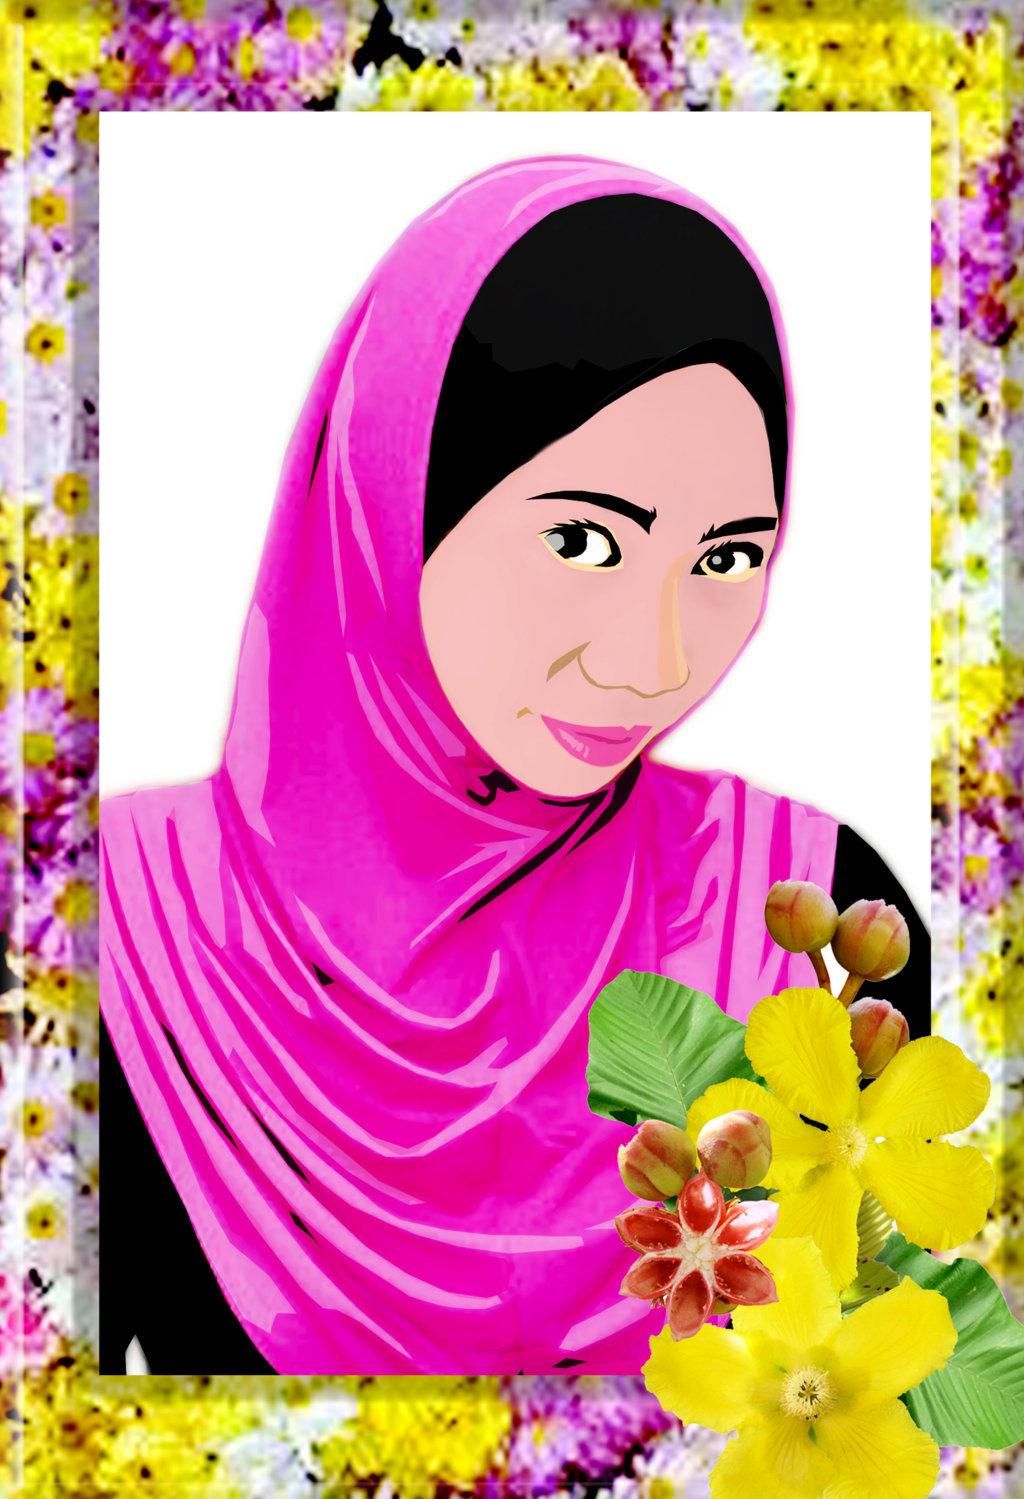 Bingkai Gambar Bunga